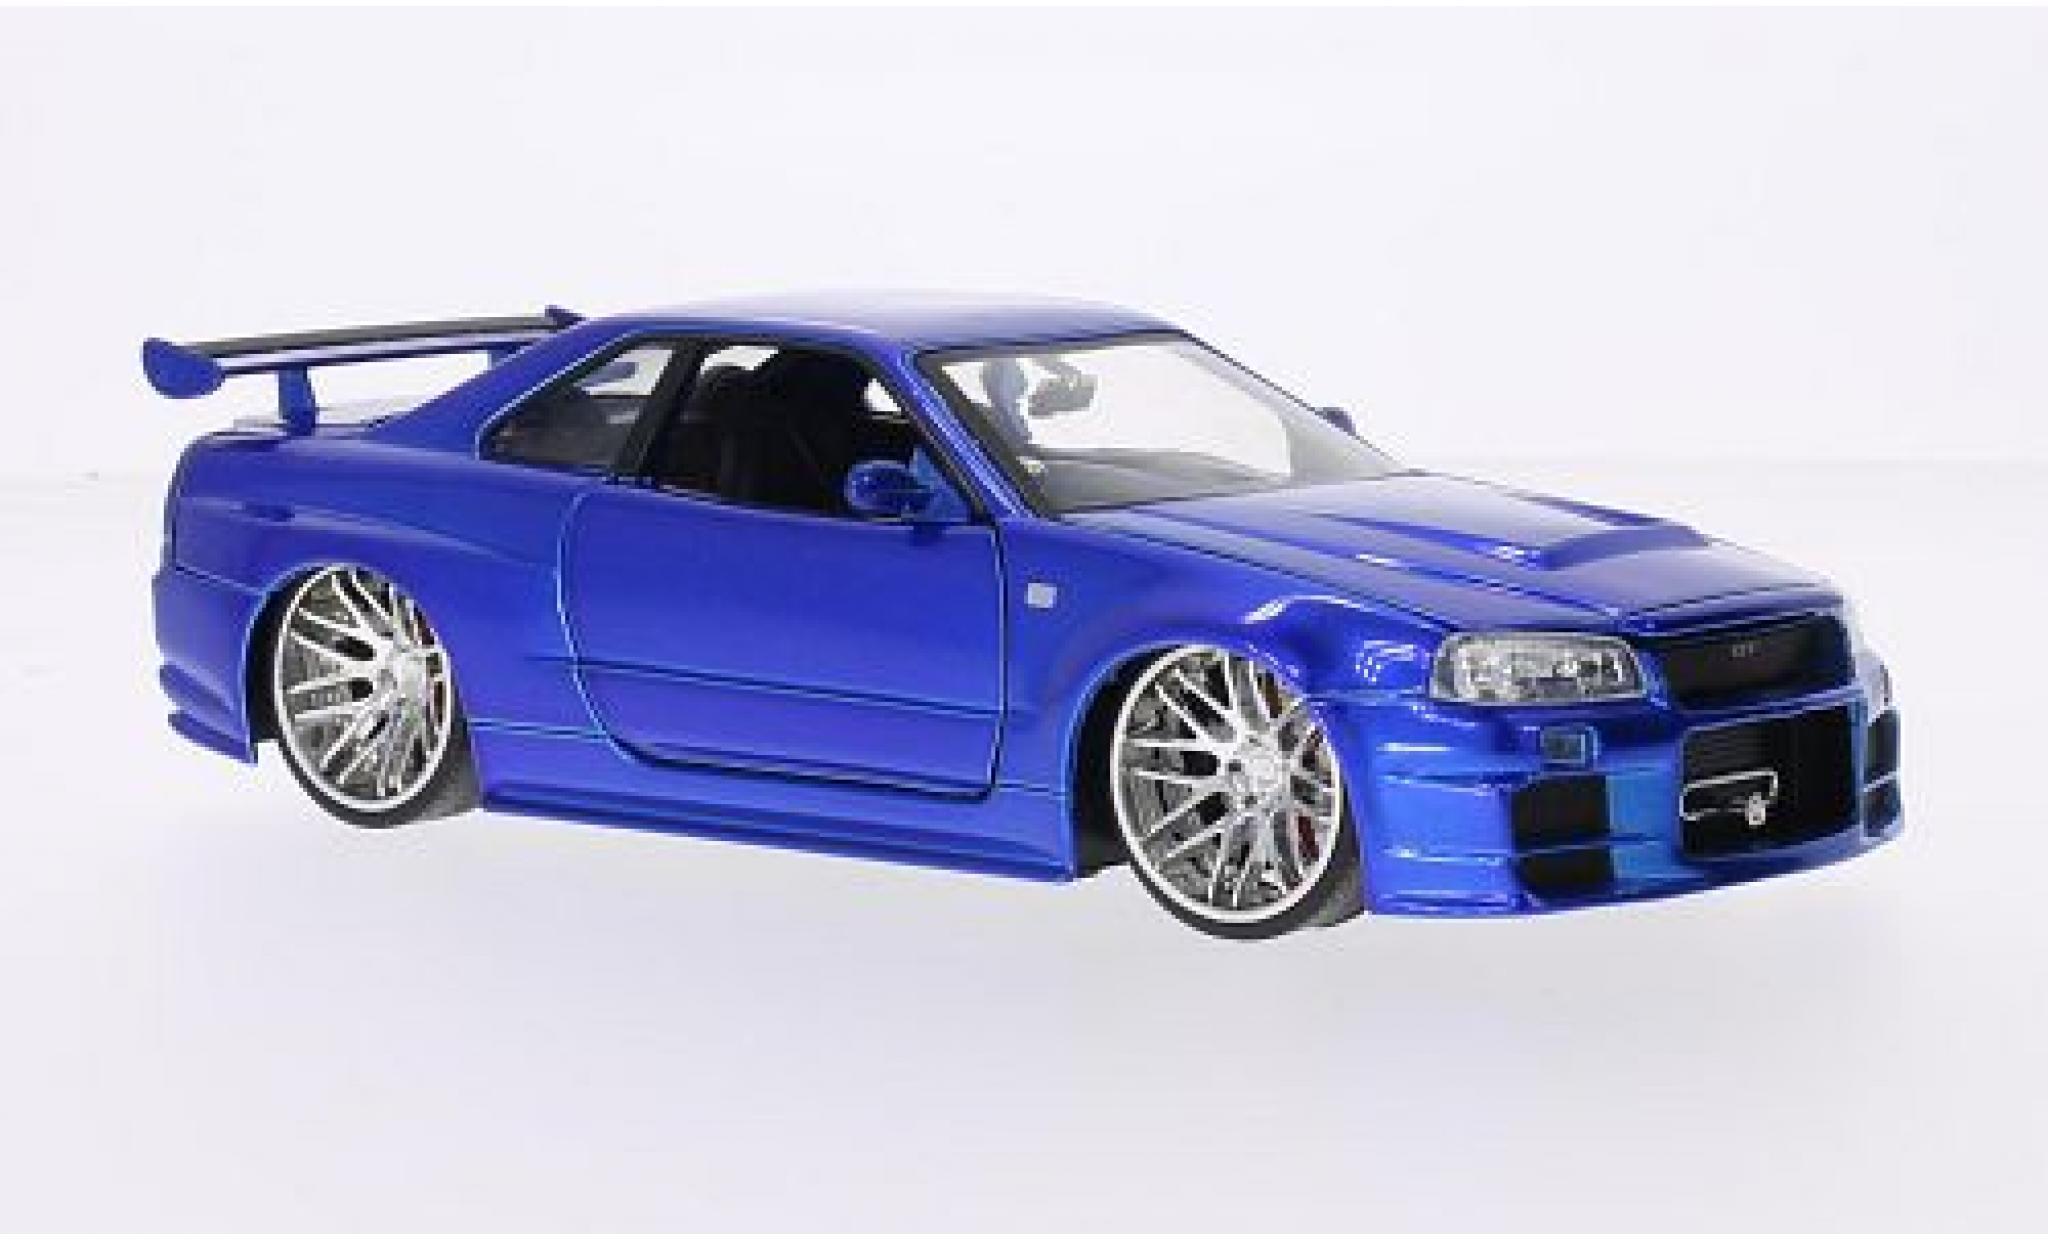 Nissan Skyline 1/24 Jada GT-R (R34) Tuning metallise blue RHD Fast & Furious 2002 tuning